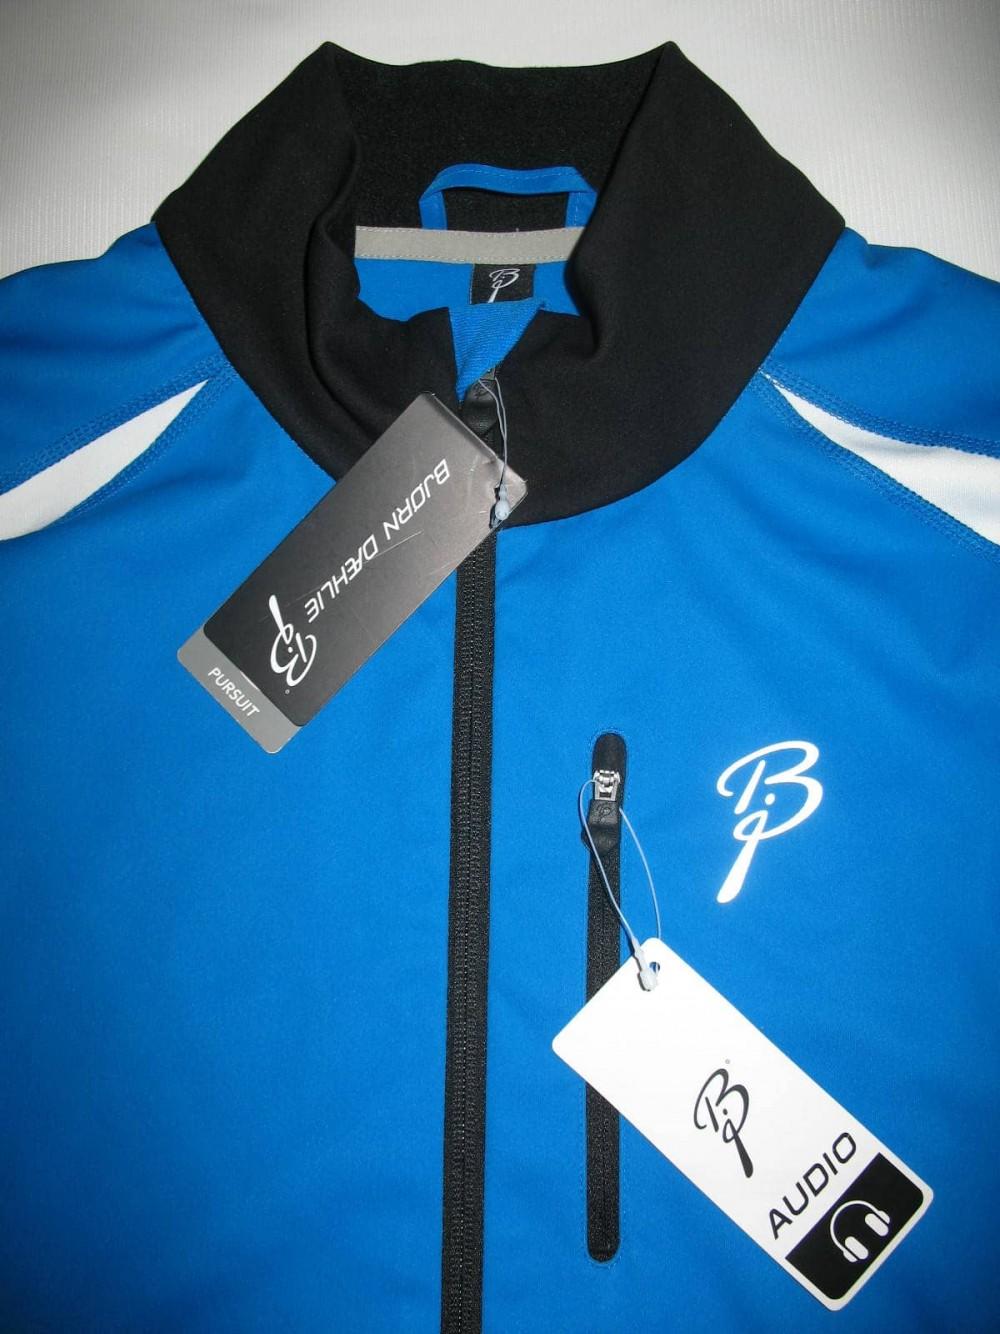 Куртка BJORN DAEHLIE by ODLO pace softshell jacket (размер XXL) - 6